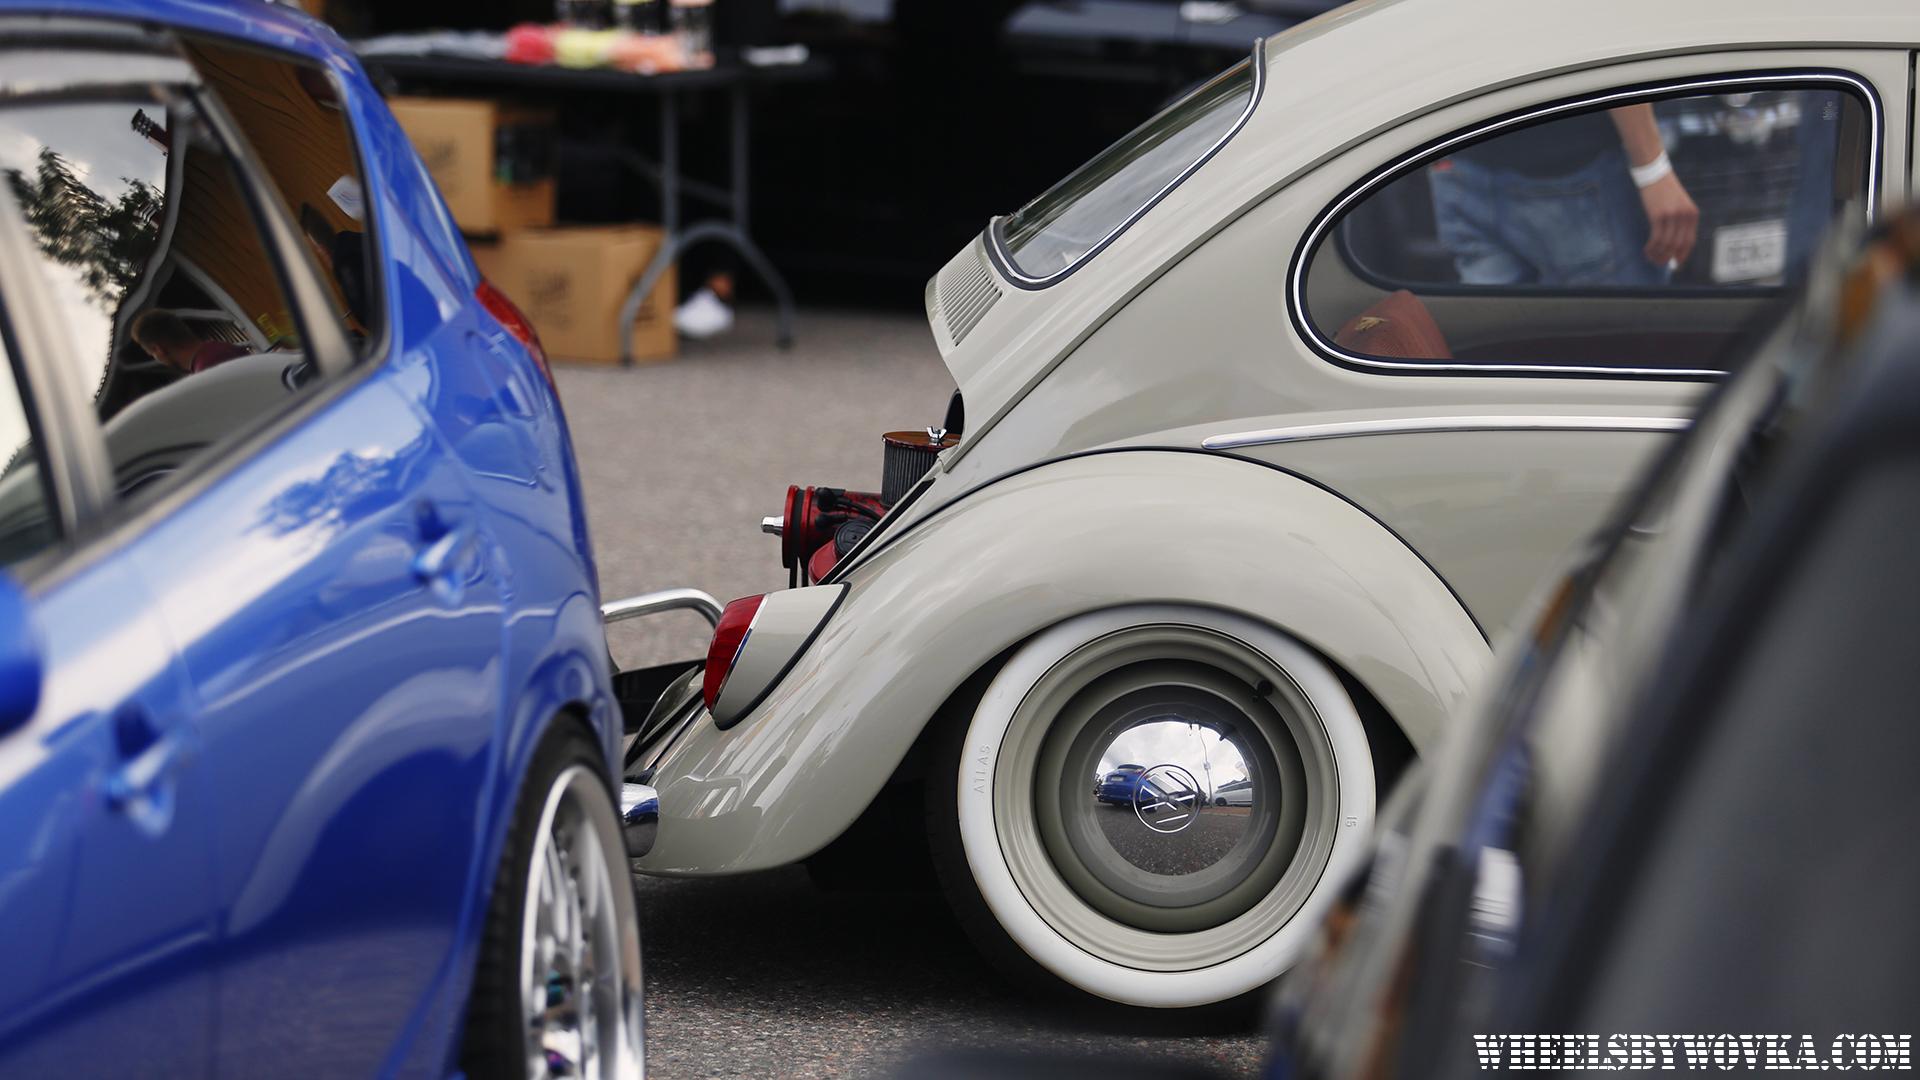 fitted-fest-lahti-finland-cdlcco-2018-by-wheelsbywovka-33